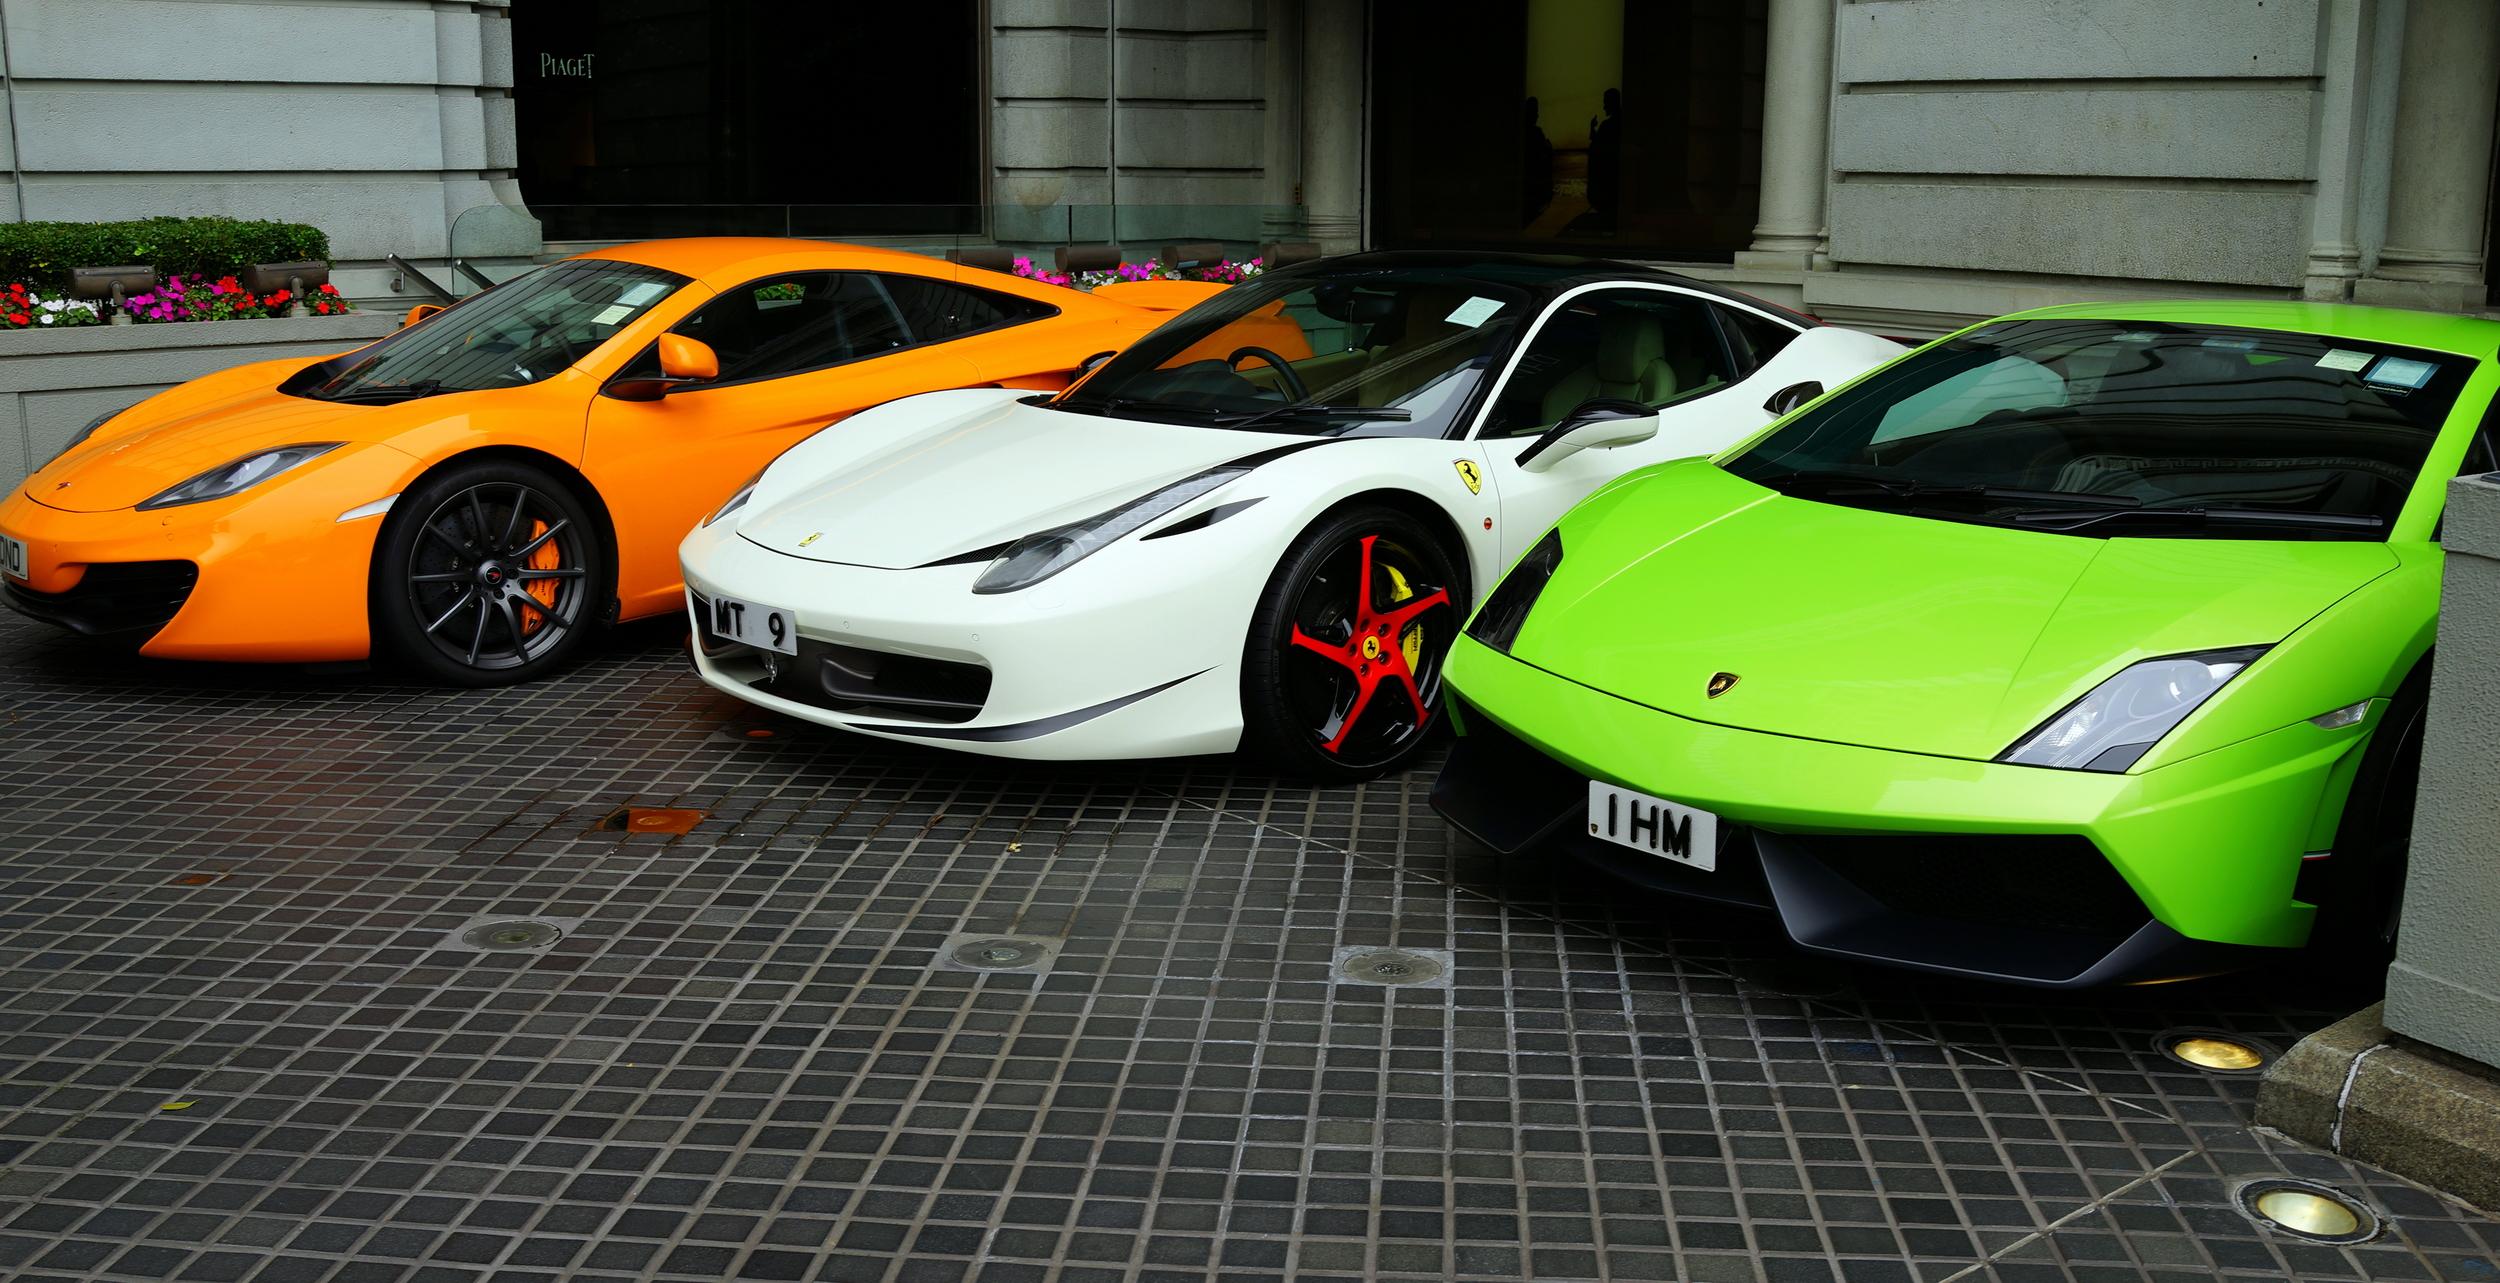 An orange McLaren, a white Ferrari and a green Lamborghini parked at the Peninsula Hotel